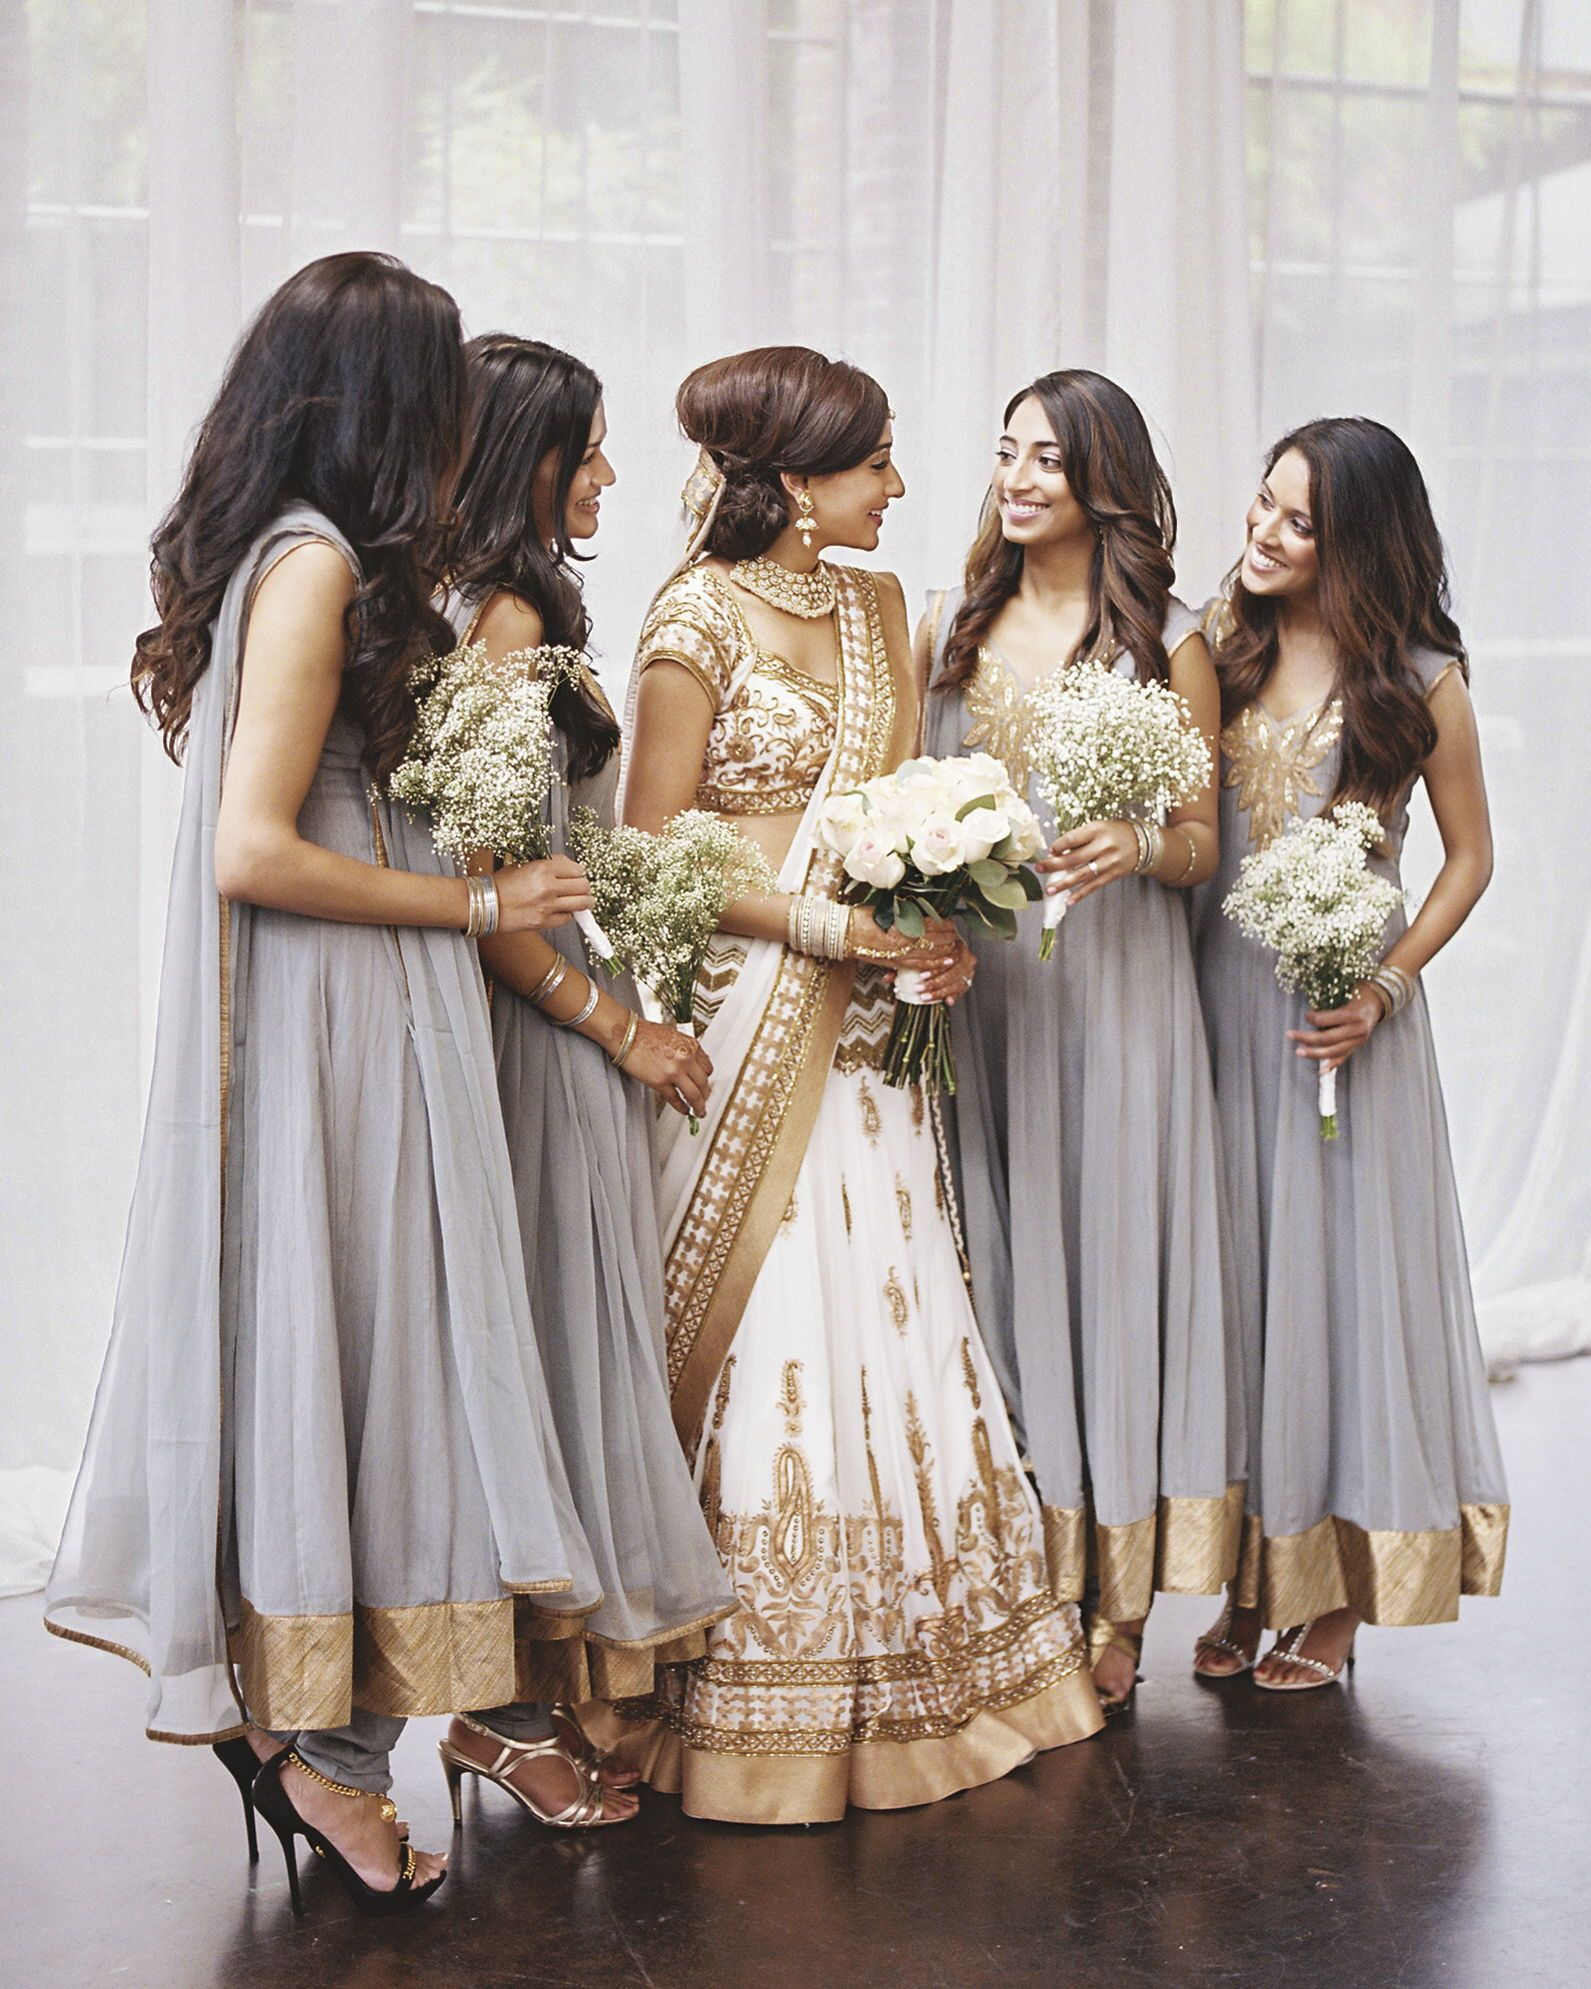 38 Looks That Prove Bridesmaids Dresses Can Be Chic Indian Bridesmaid Dresses Indian Bridesmaid Indian Wedding Dress [ 1989 x 1591 Pixel ]